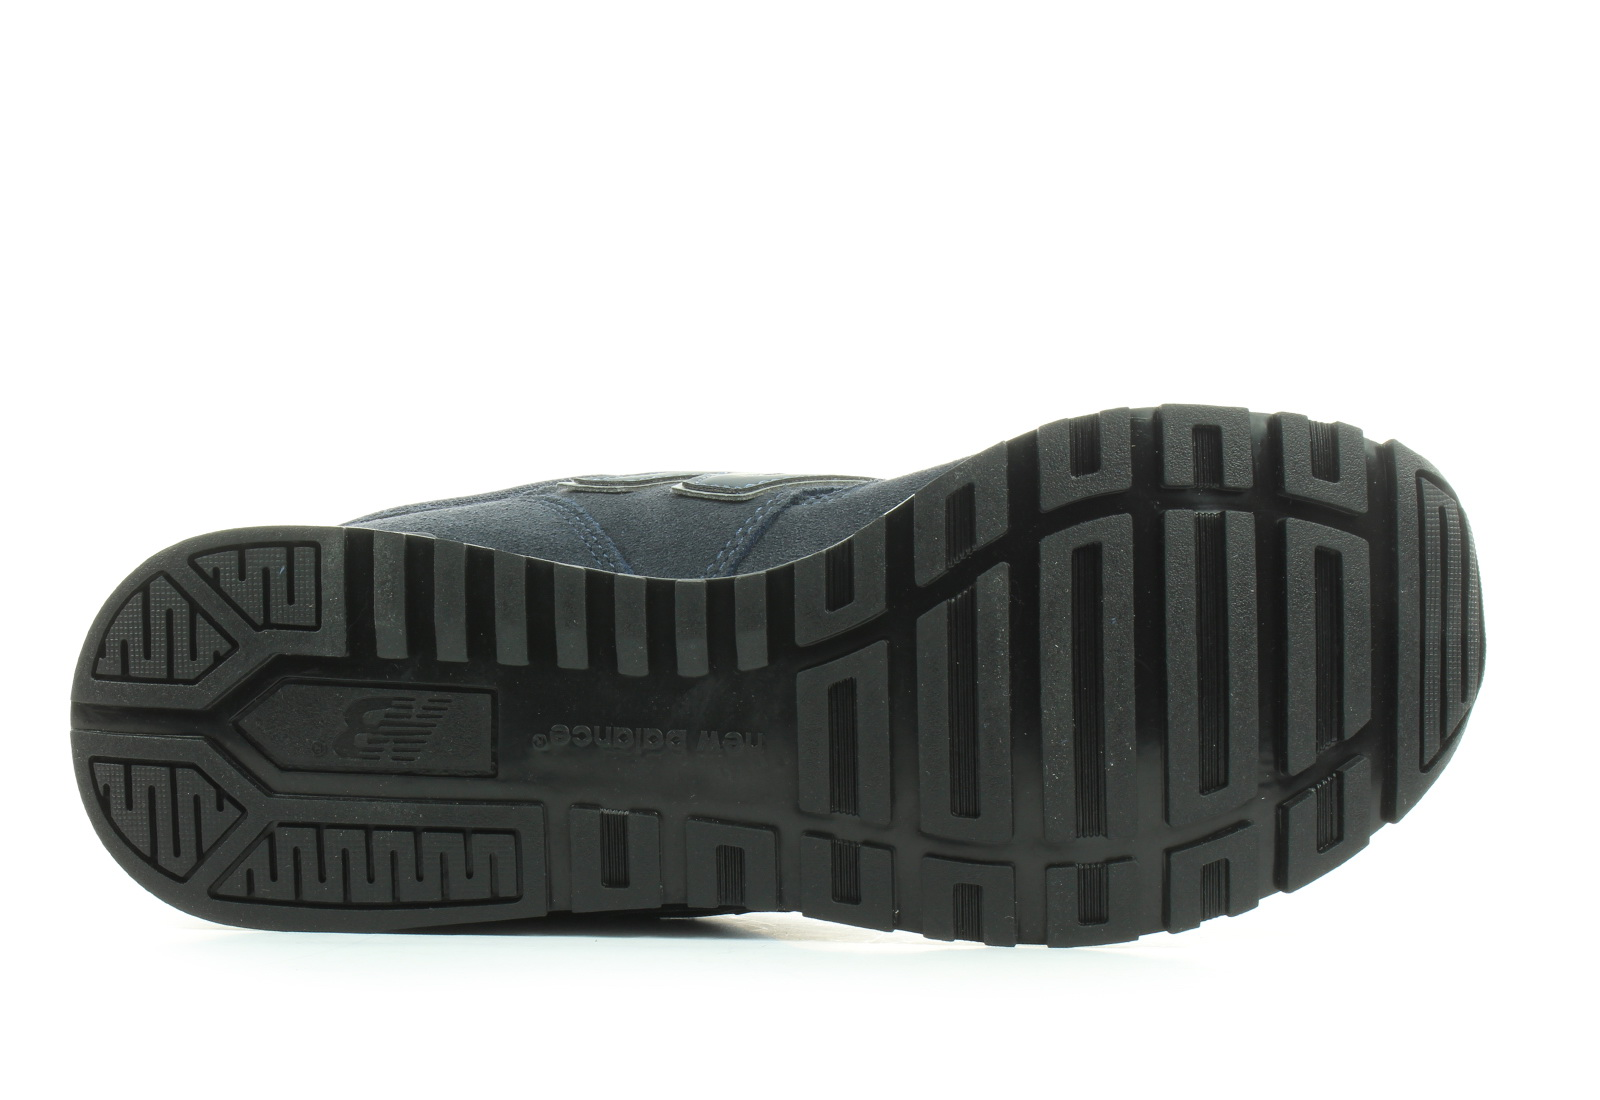 7647d56bb4a New Balance Niske Cipele Plave Cipele - Ml565cn - Office Shoes - Online  trgovina obuće